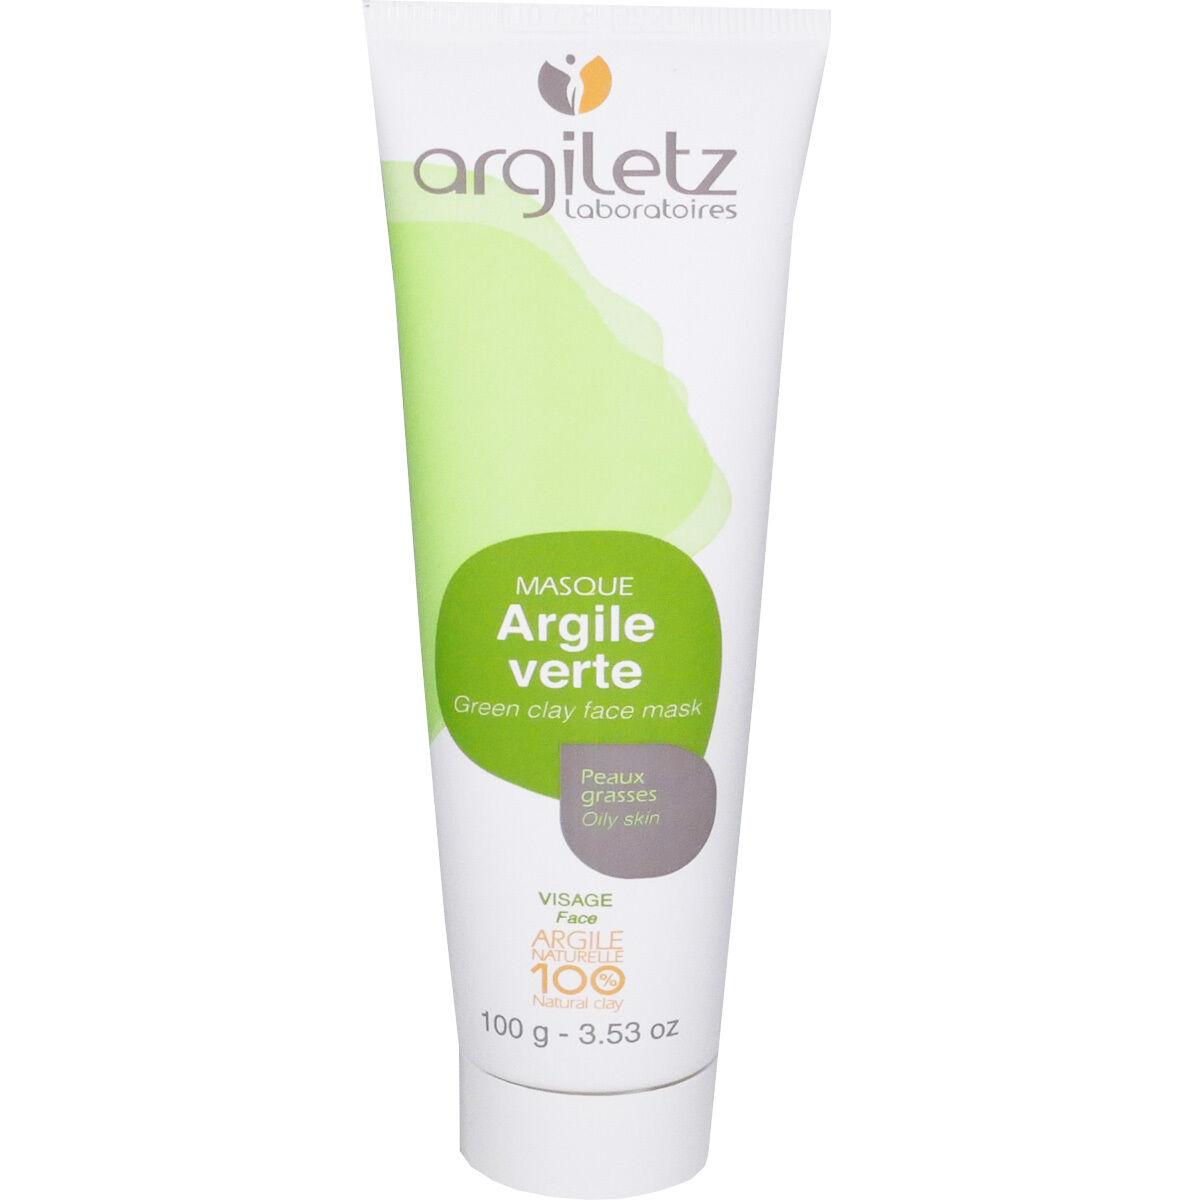 Argiletz argile verte peaux grasses 100 g